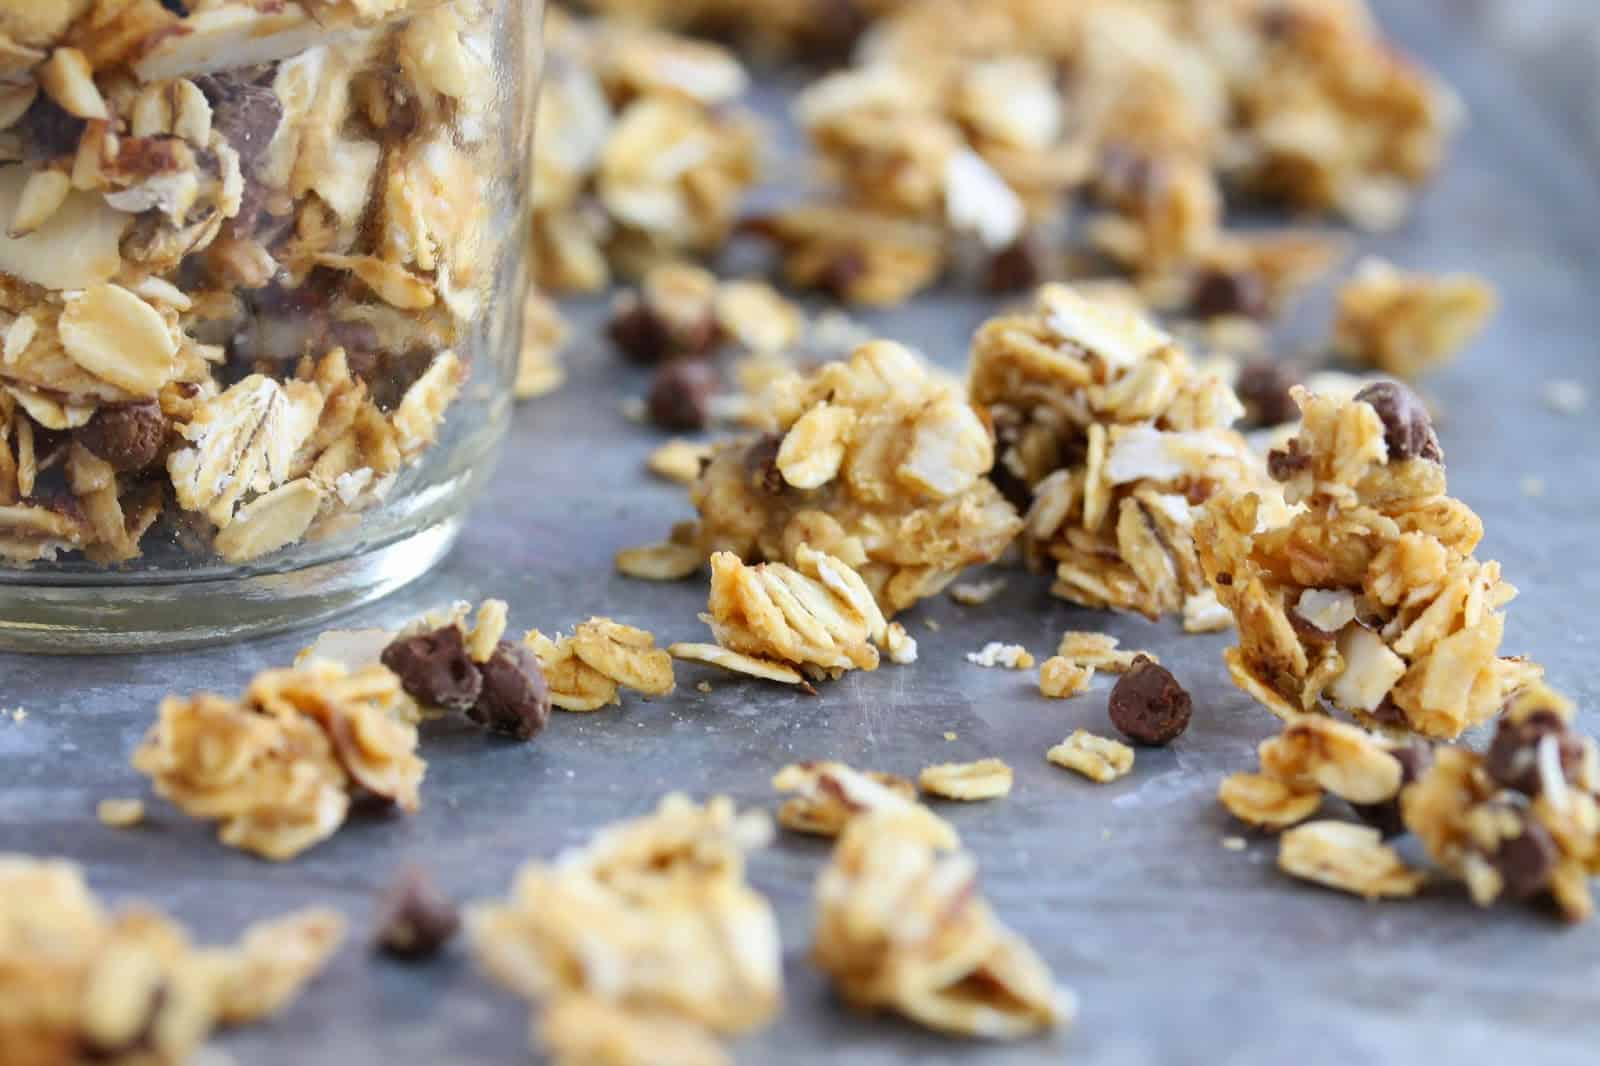 Honey Nut Granola on a countertop.